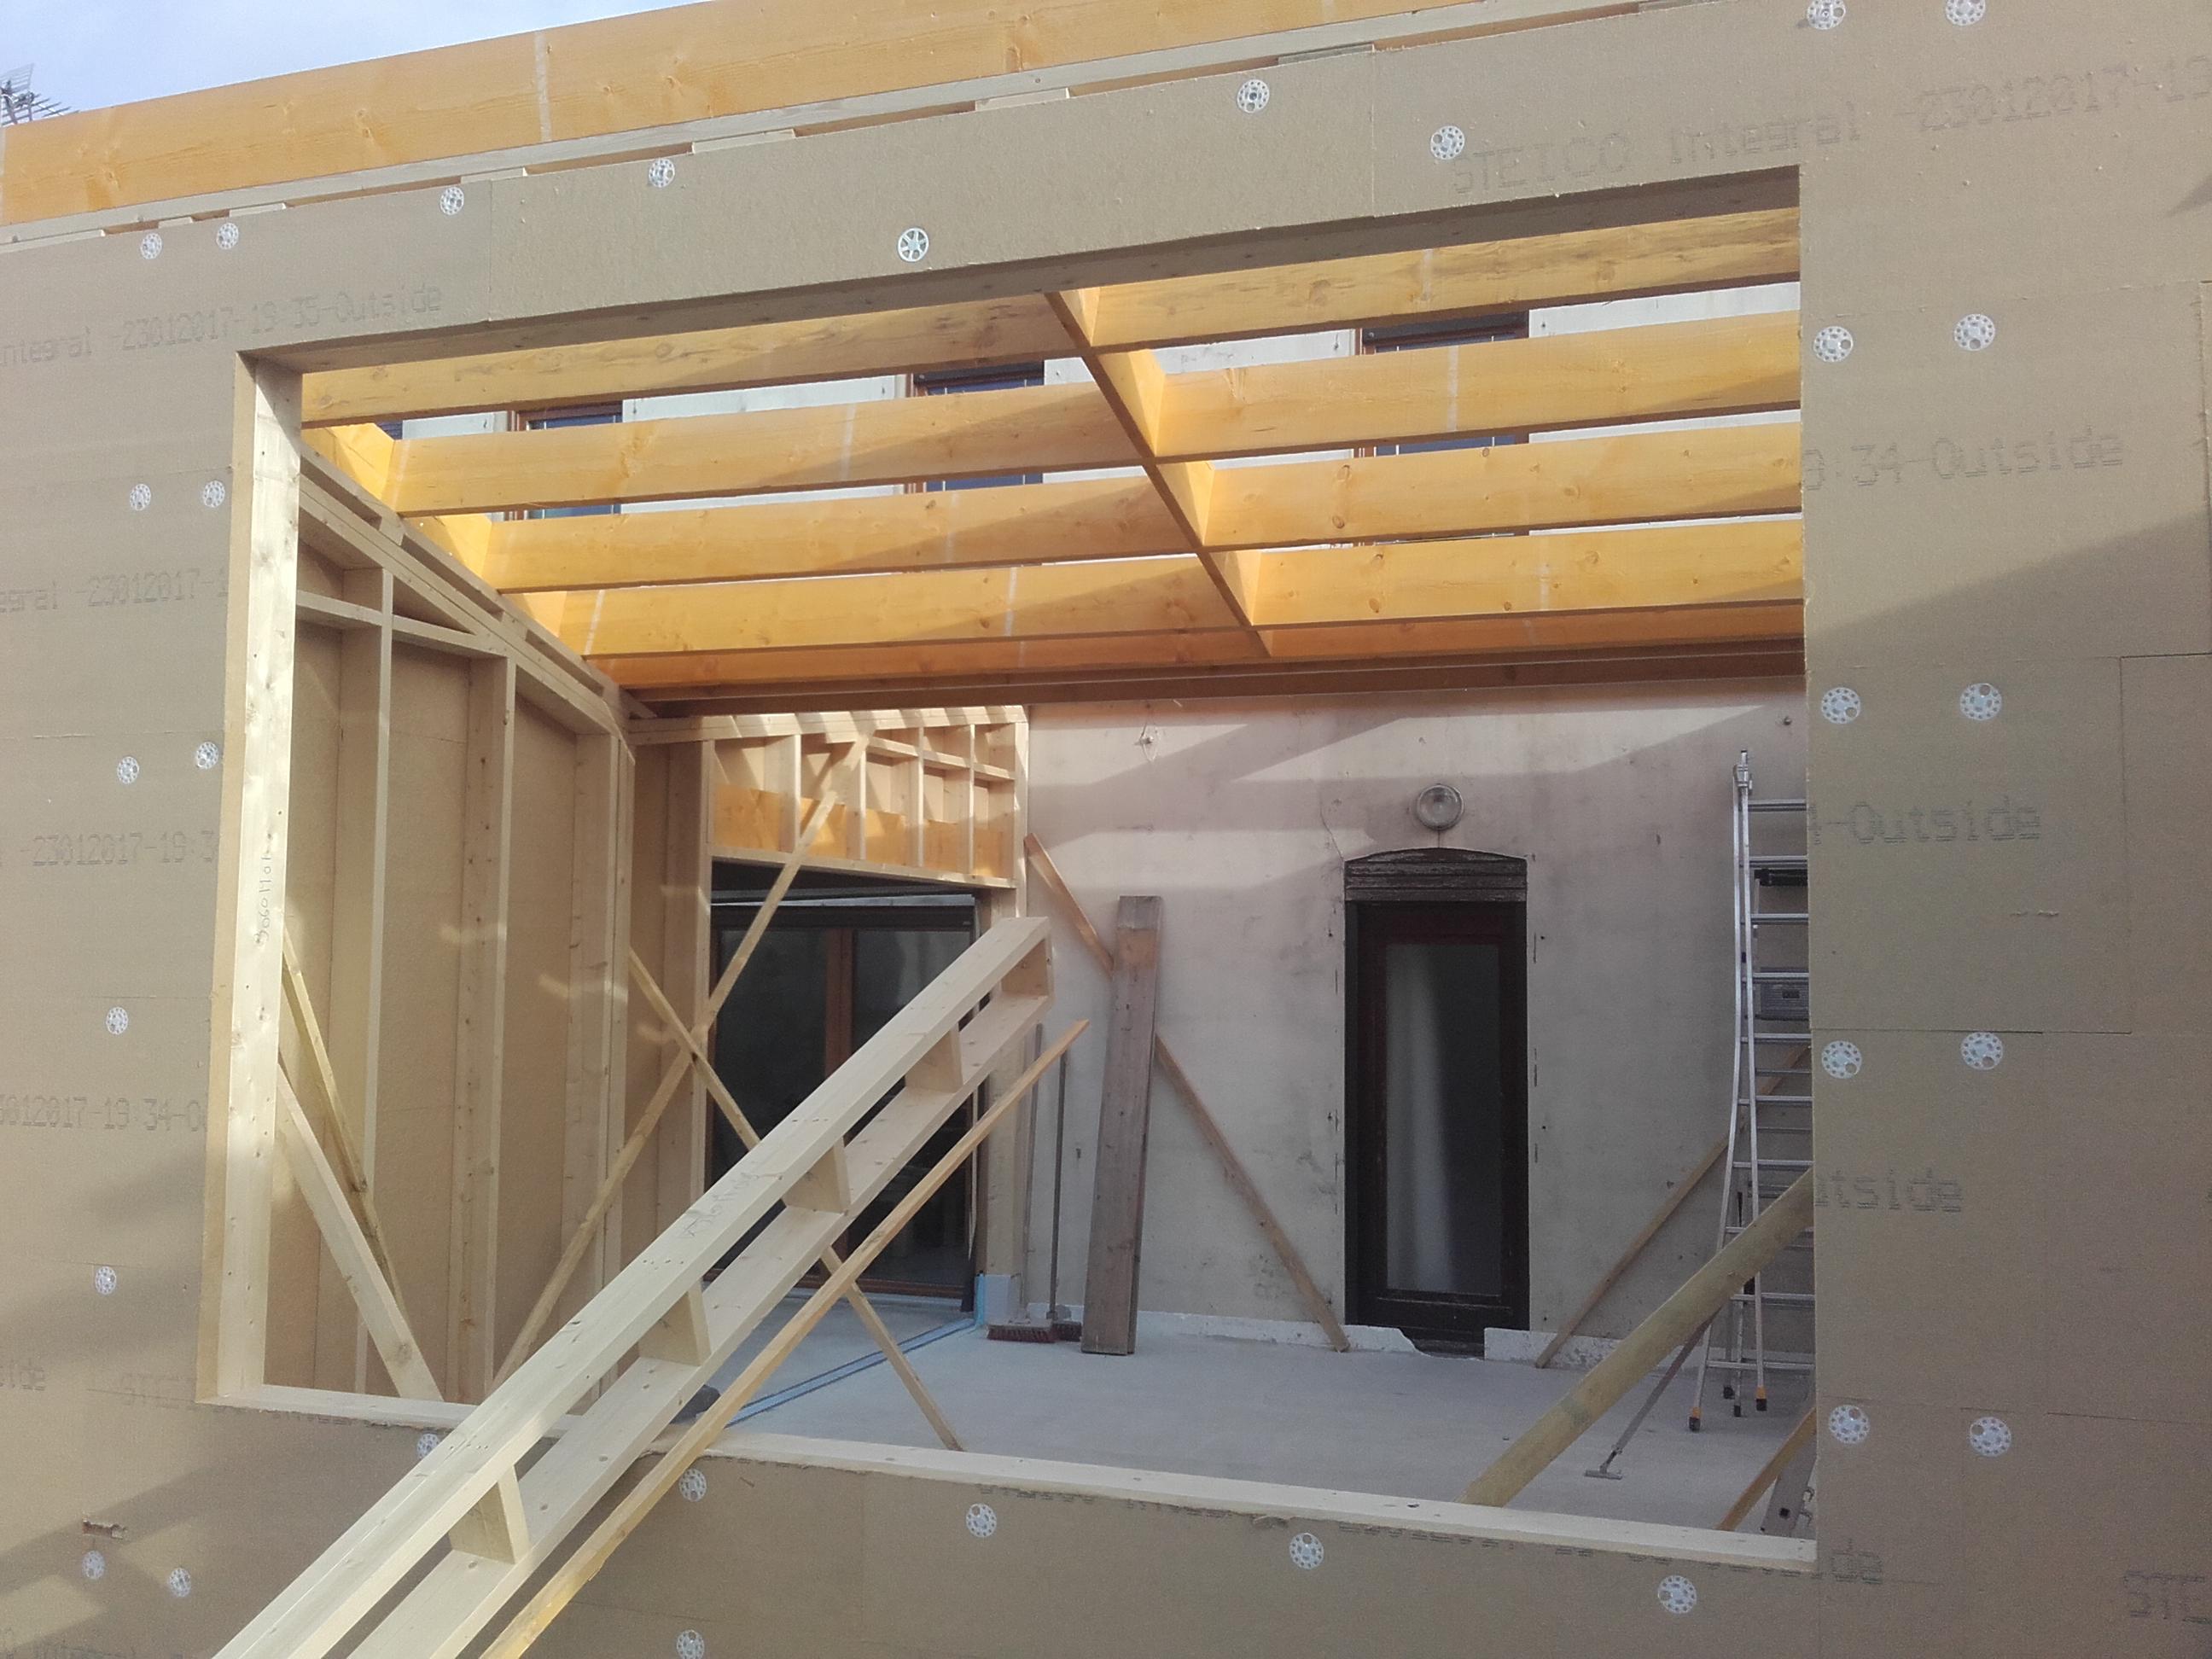 Maison ossature bois charpente en bois avesnois et nord for Construction ossature bois